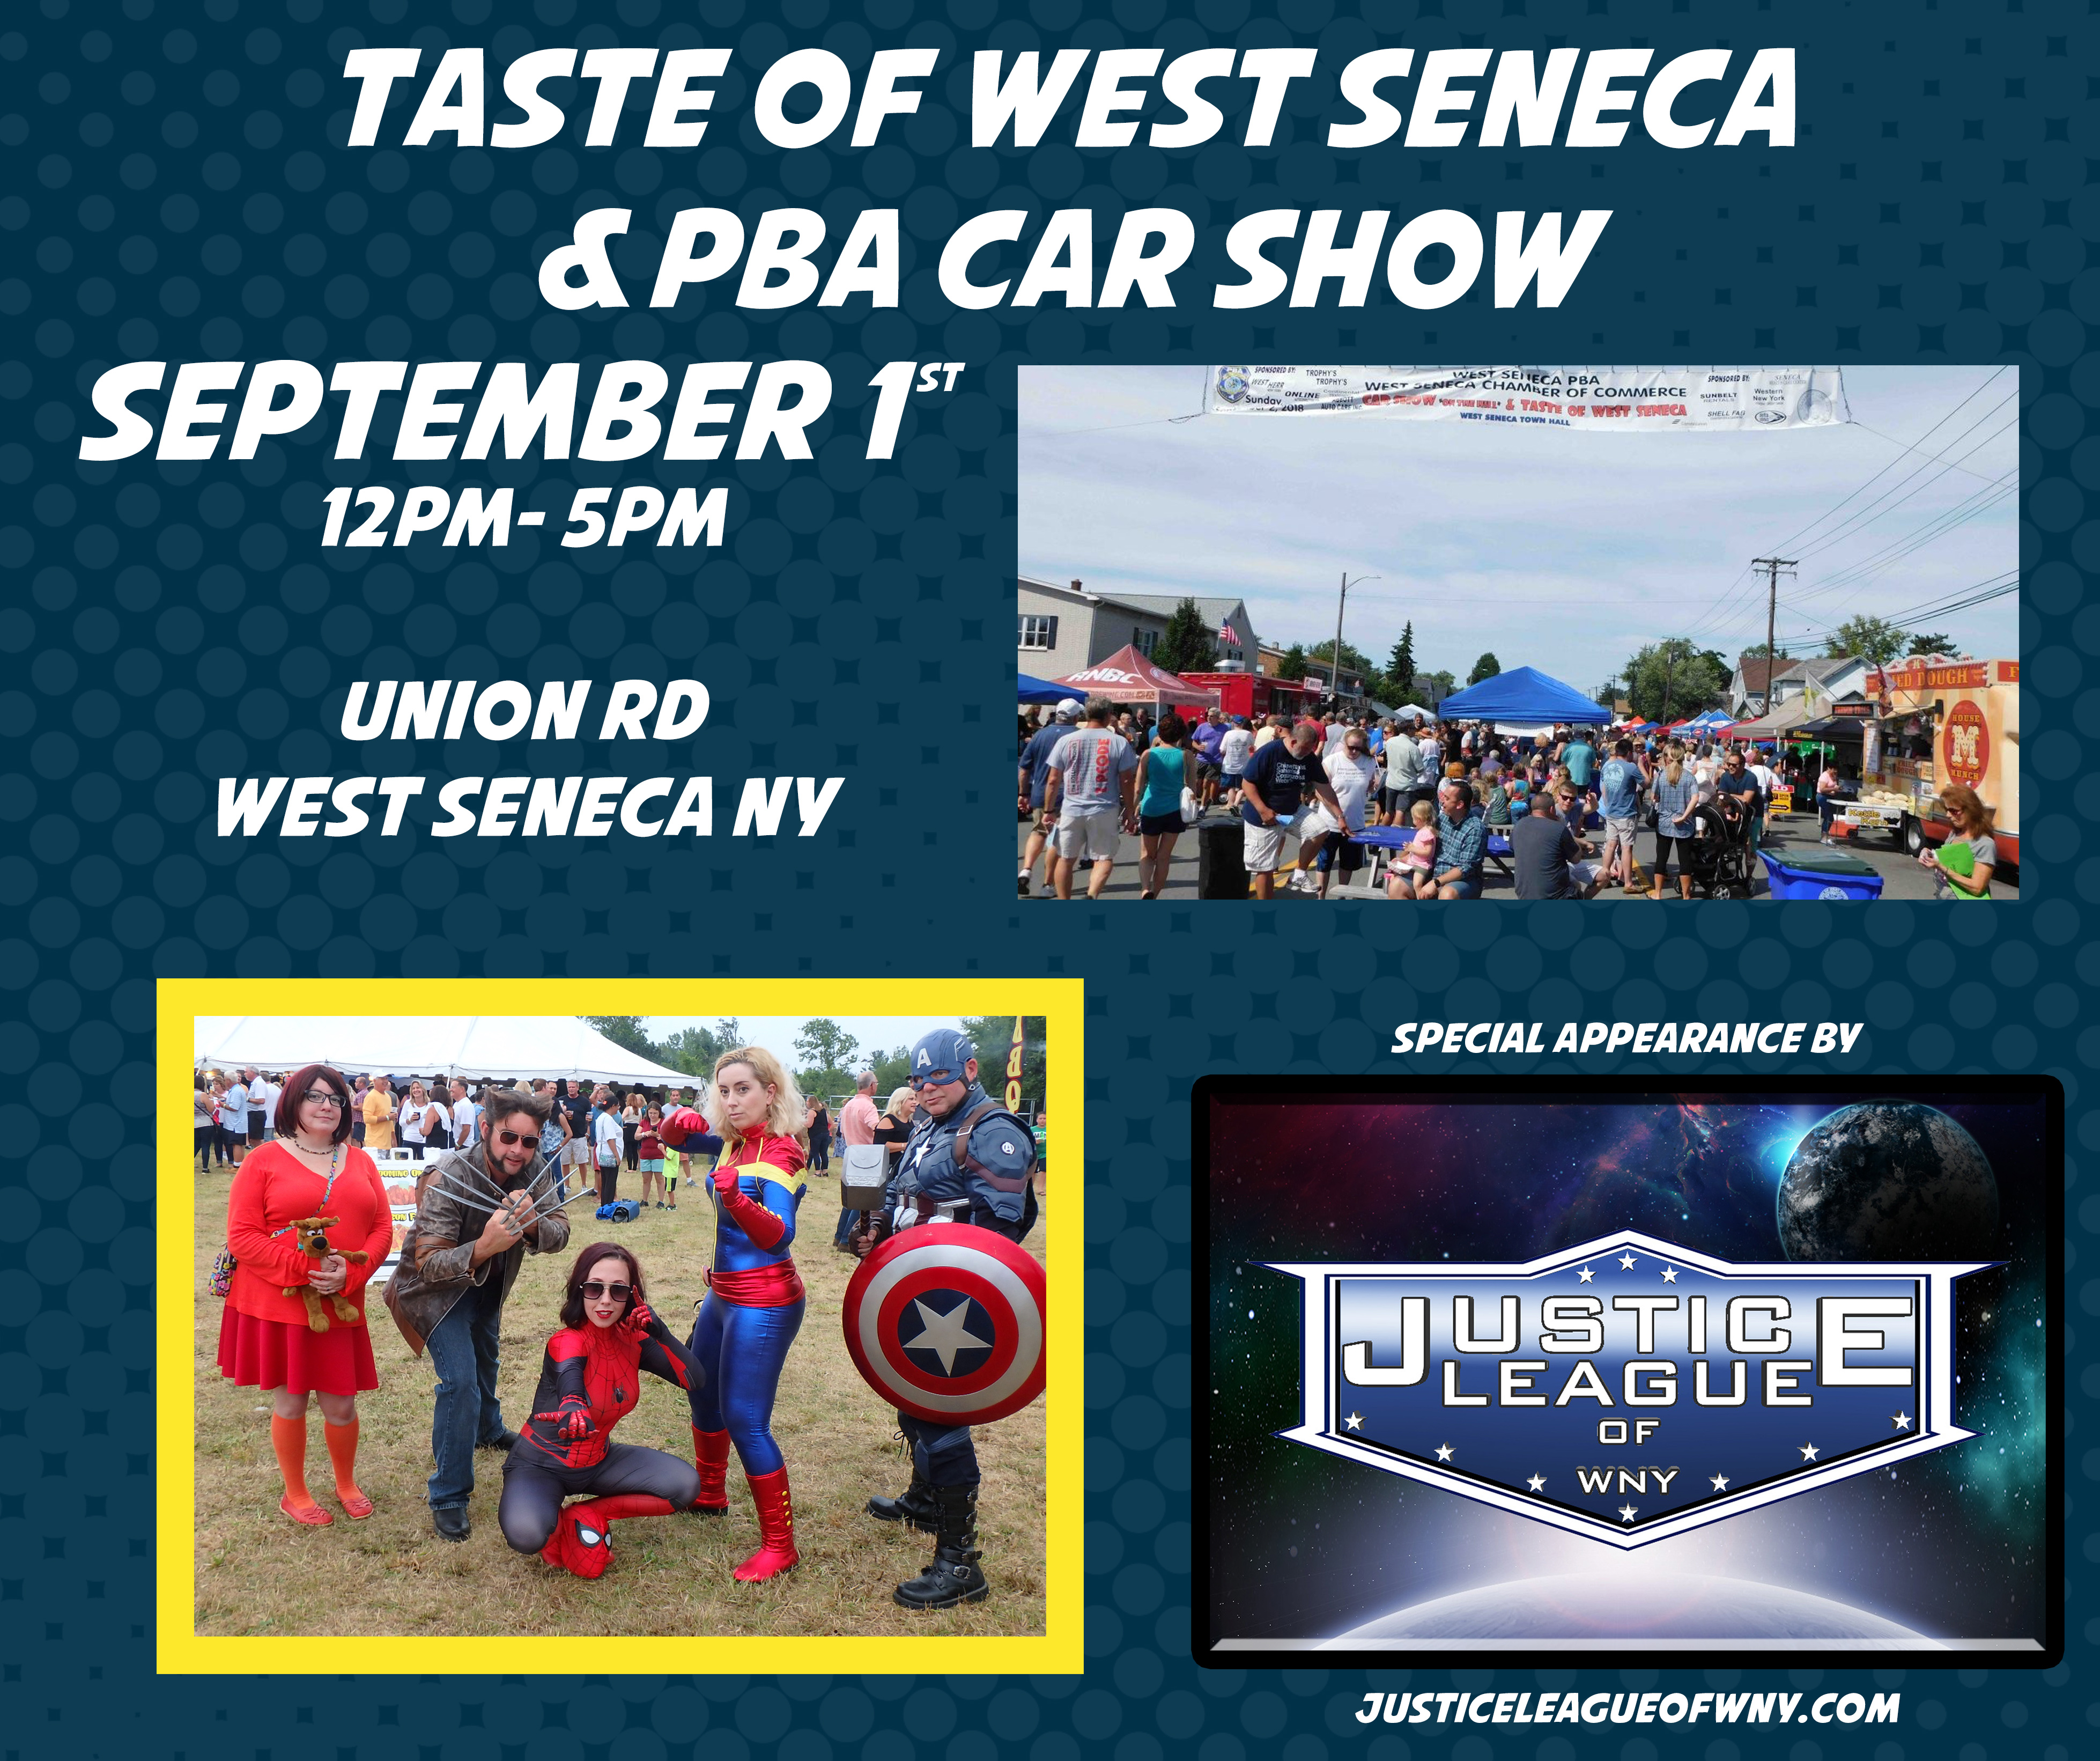 Taste of West Seneca